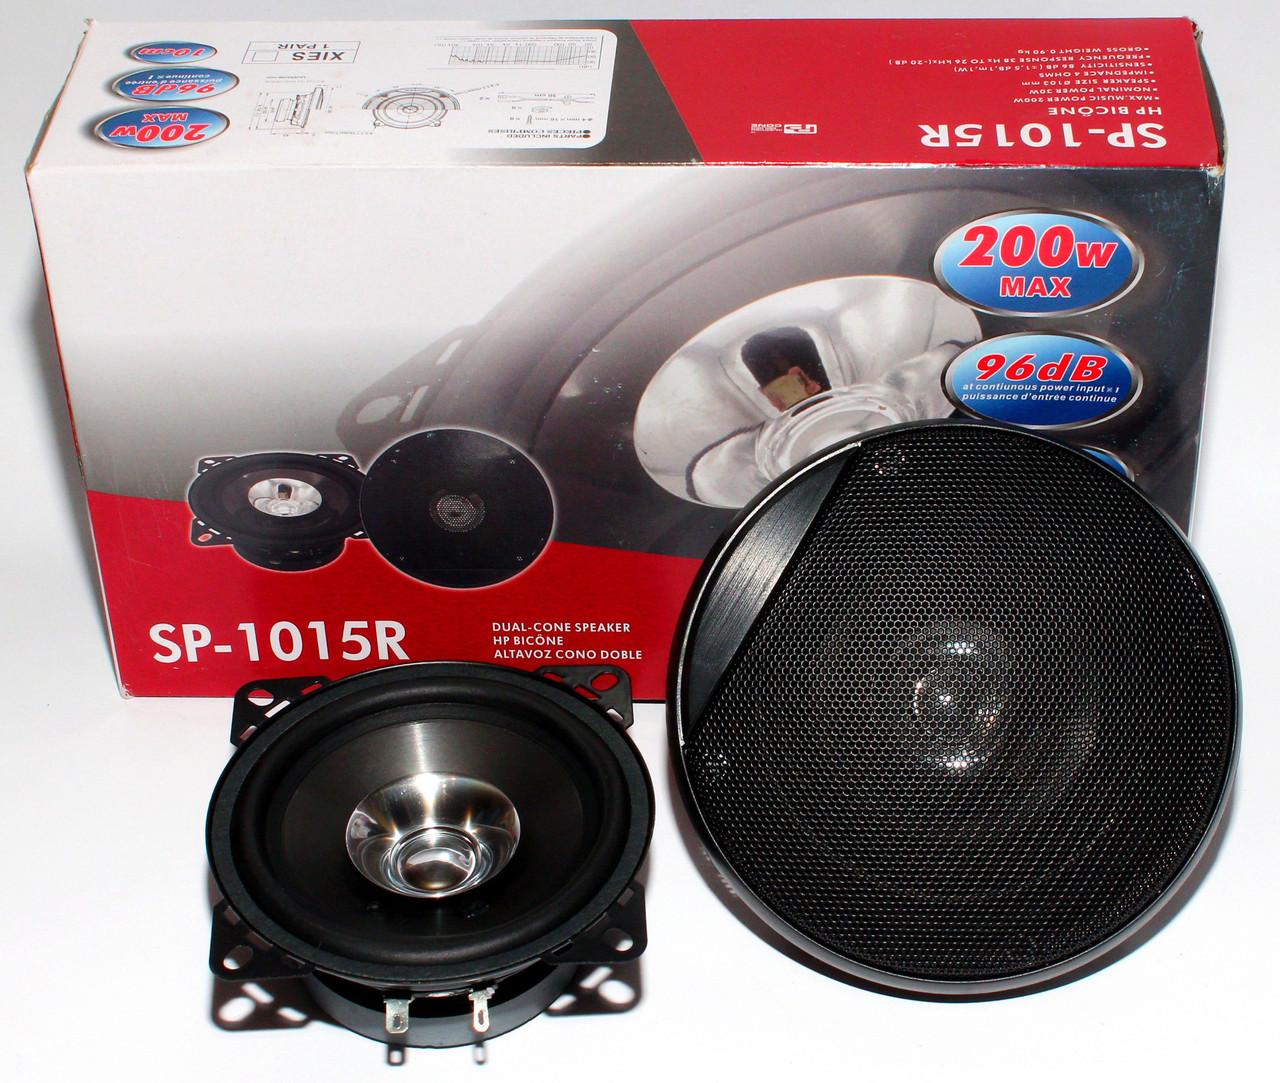 Автомобильная акустика Pioneer SP-1015R 200W реплика